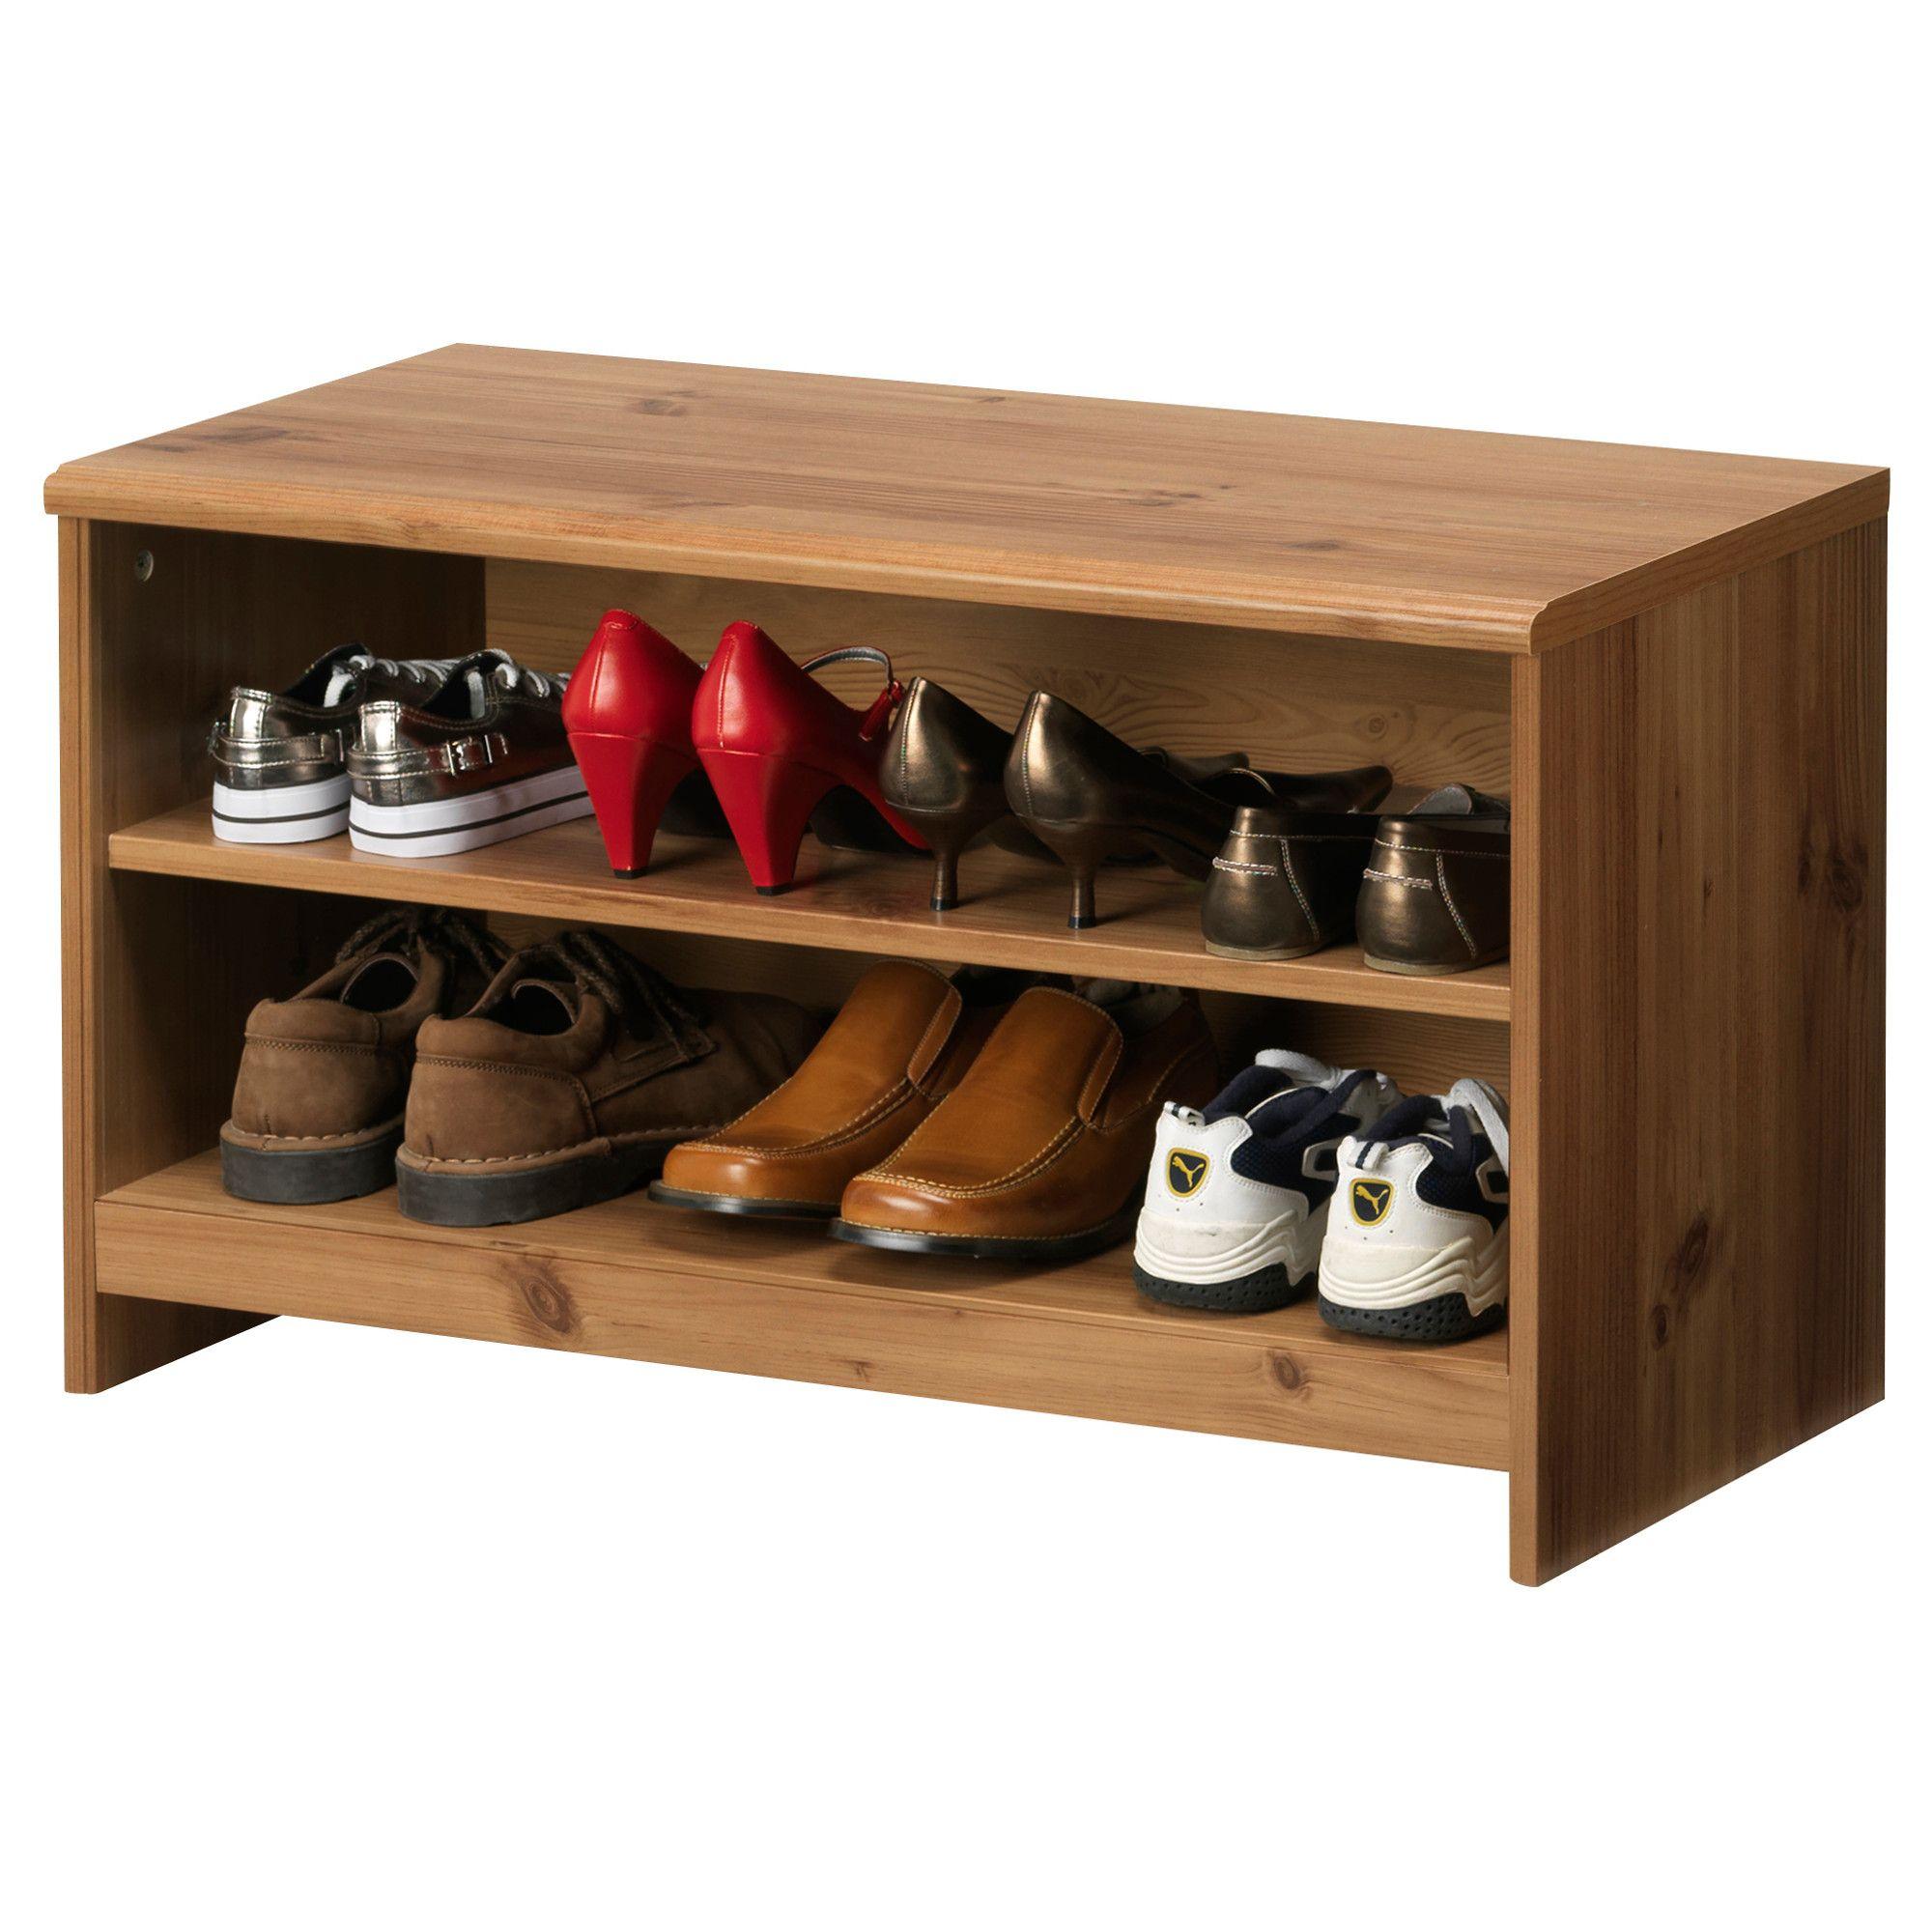 Ikea Australia Affordable Swedish Home Furniture Shoe Storage Bench Ikea Bench With Shoe Storage Shoe Storage